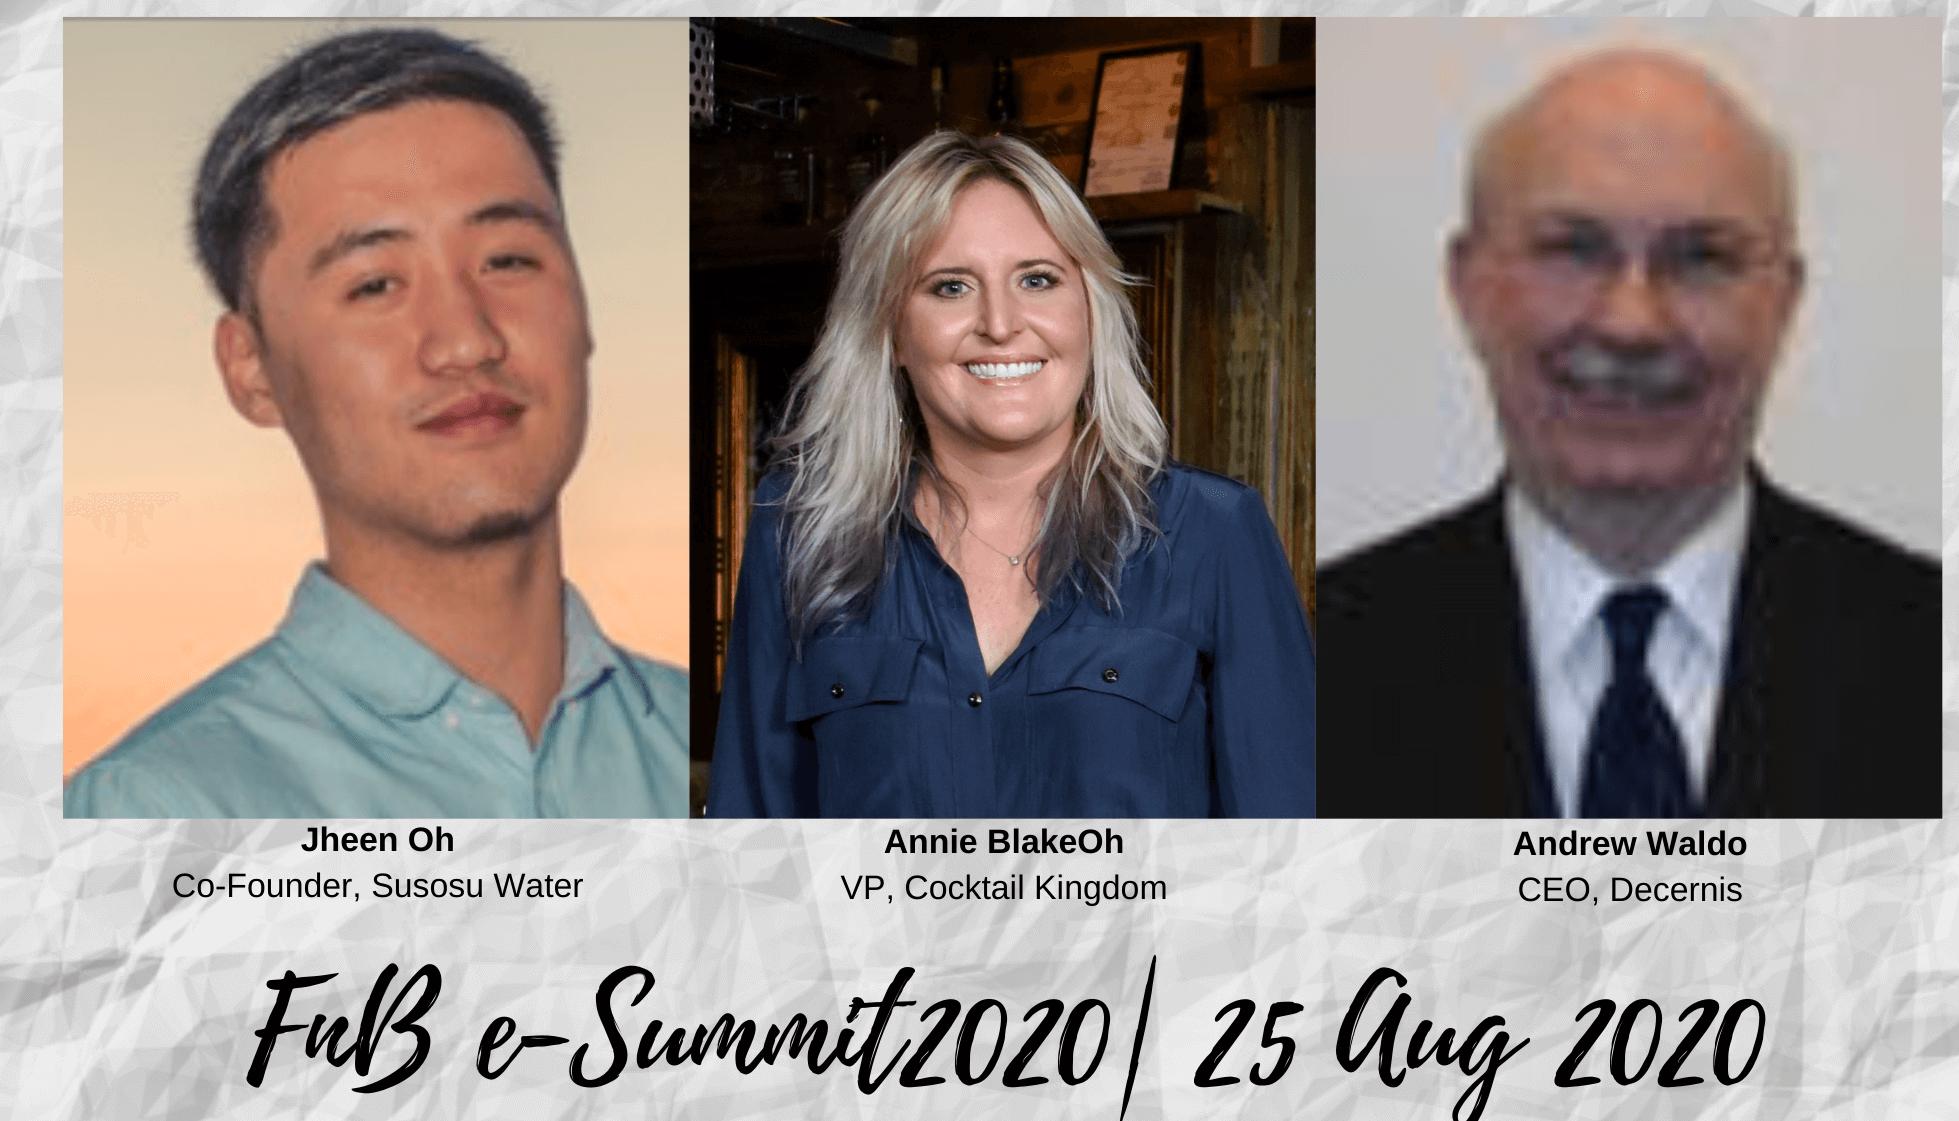 Day 2 – Session 2: F&B e-Summit 2020 (Aug 25th, 2020)